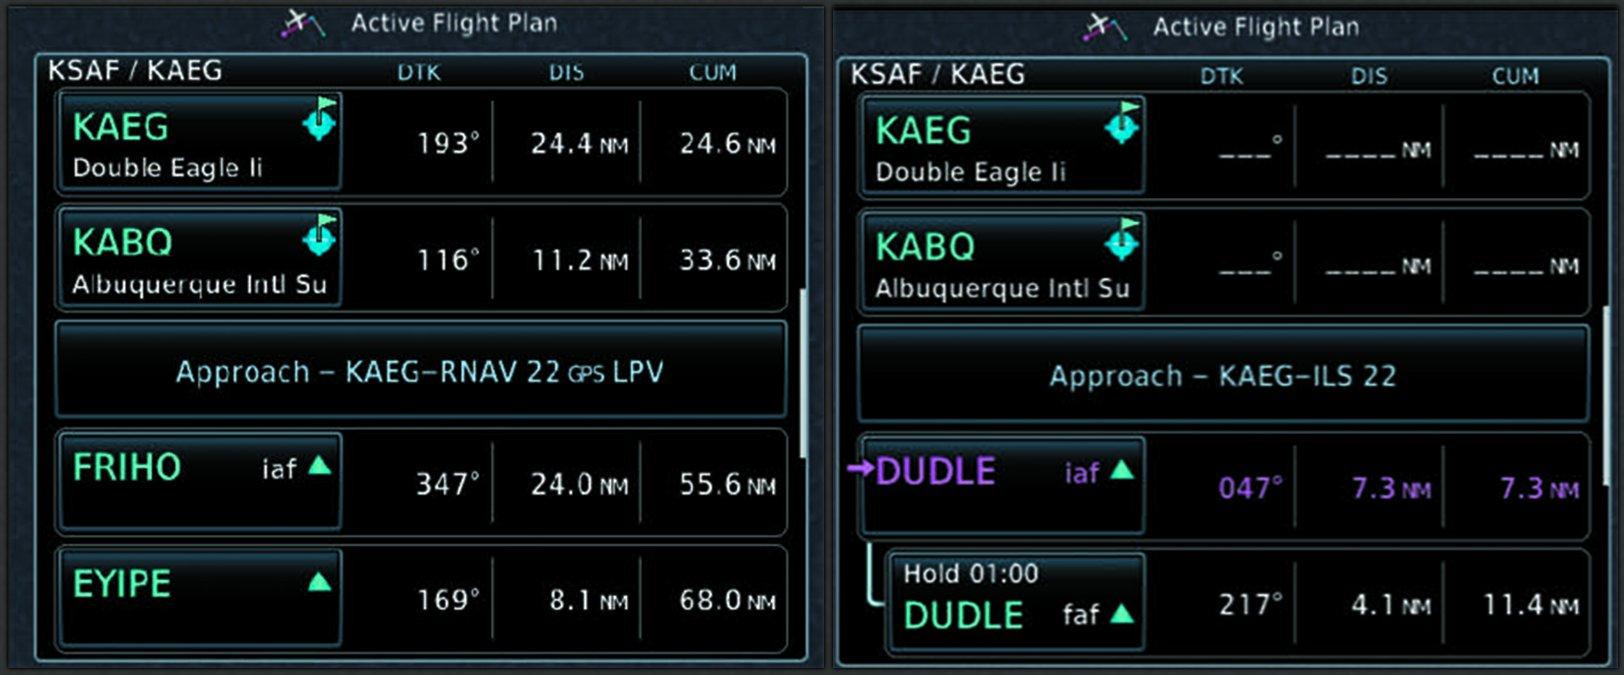 Active Flight Plan